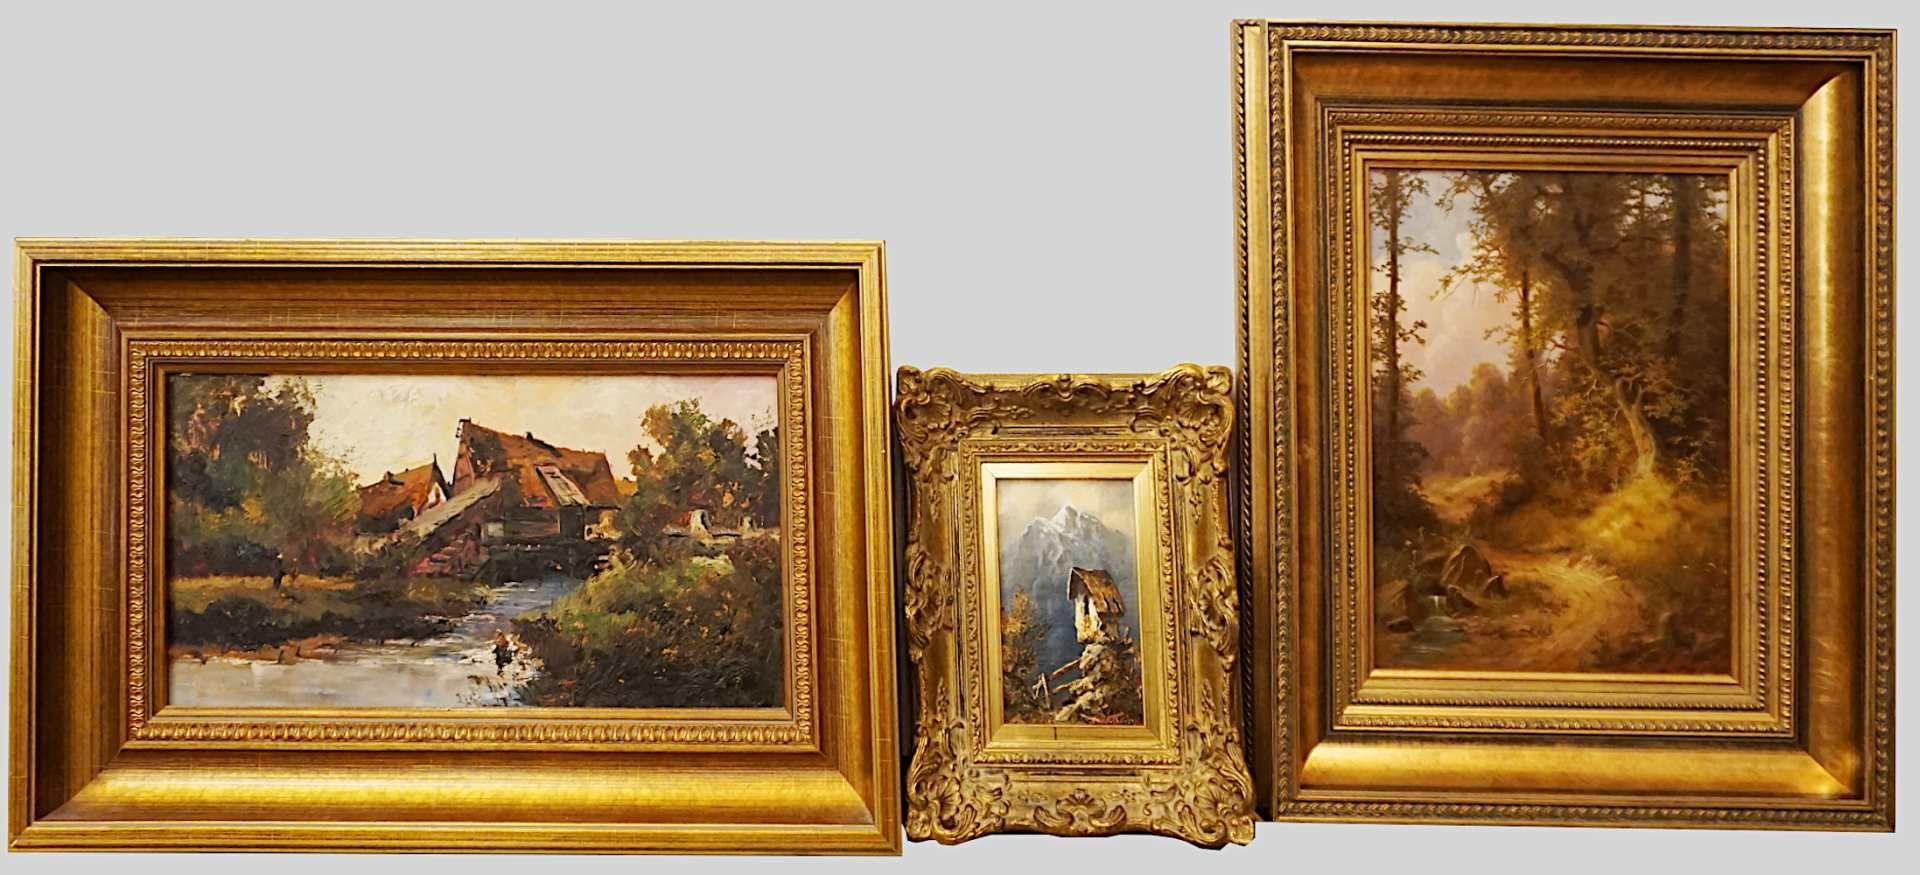 "1 Konv. Ölgemälde des 20. Jh., versch. Künstler, z.T. sign. F. RAHM: ""Beschattete A - Bild 4 aus 5"